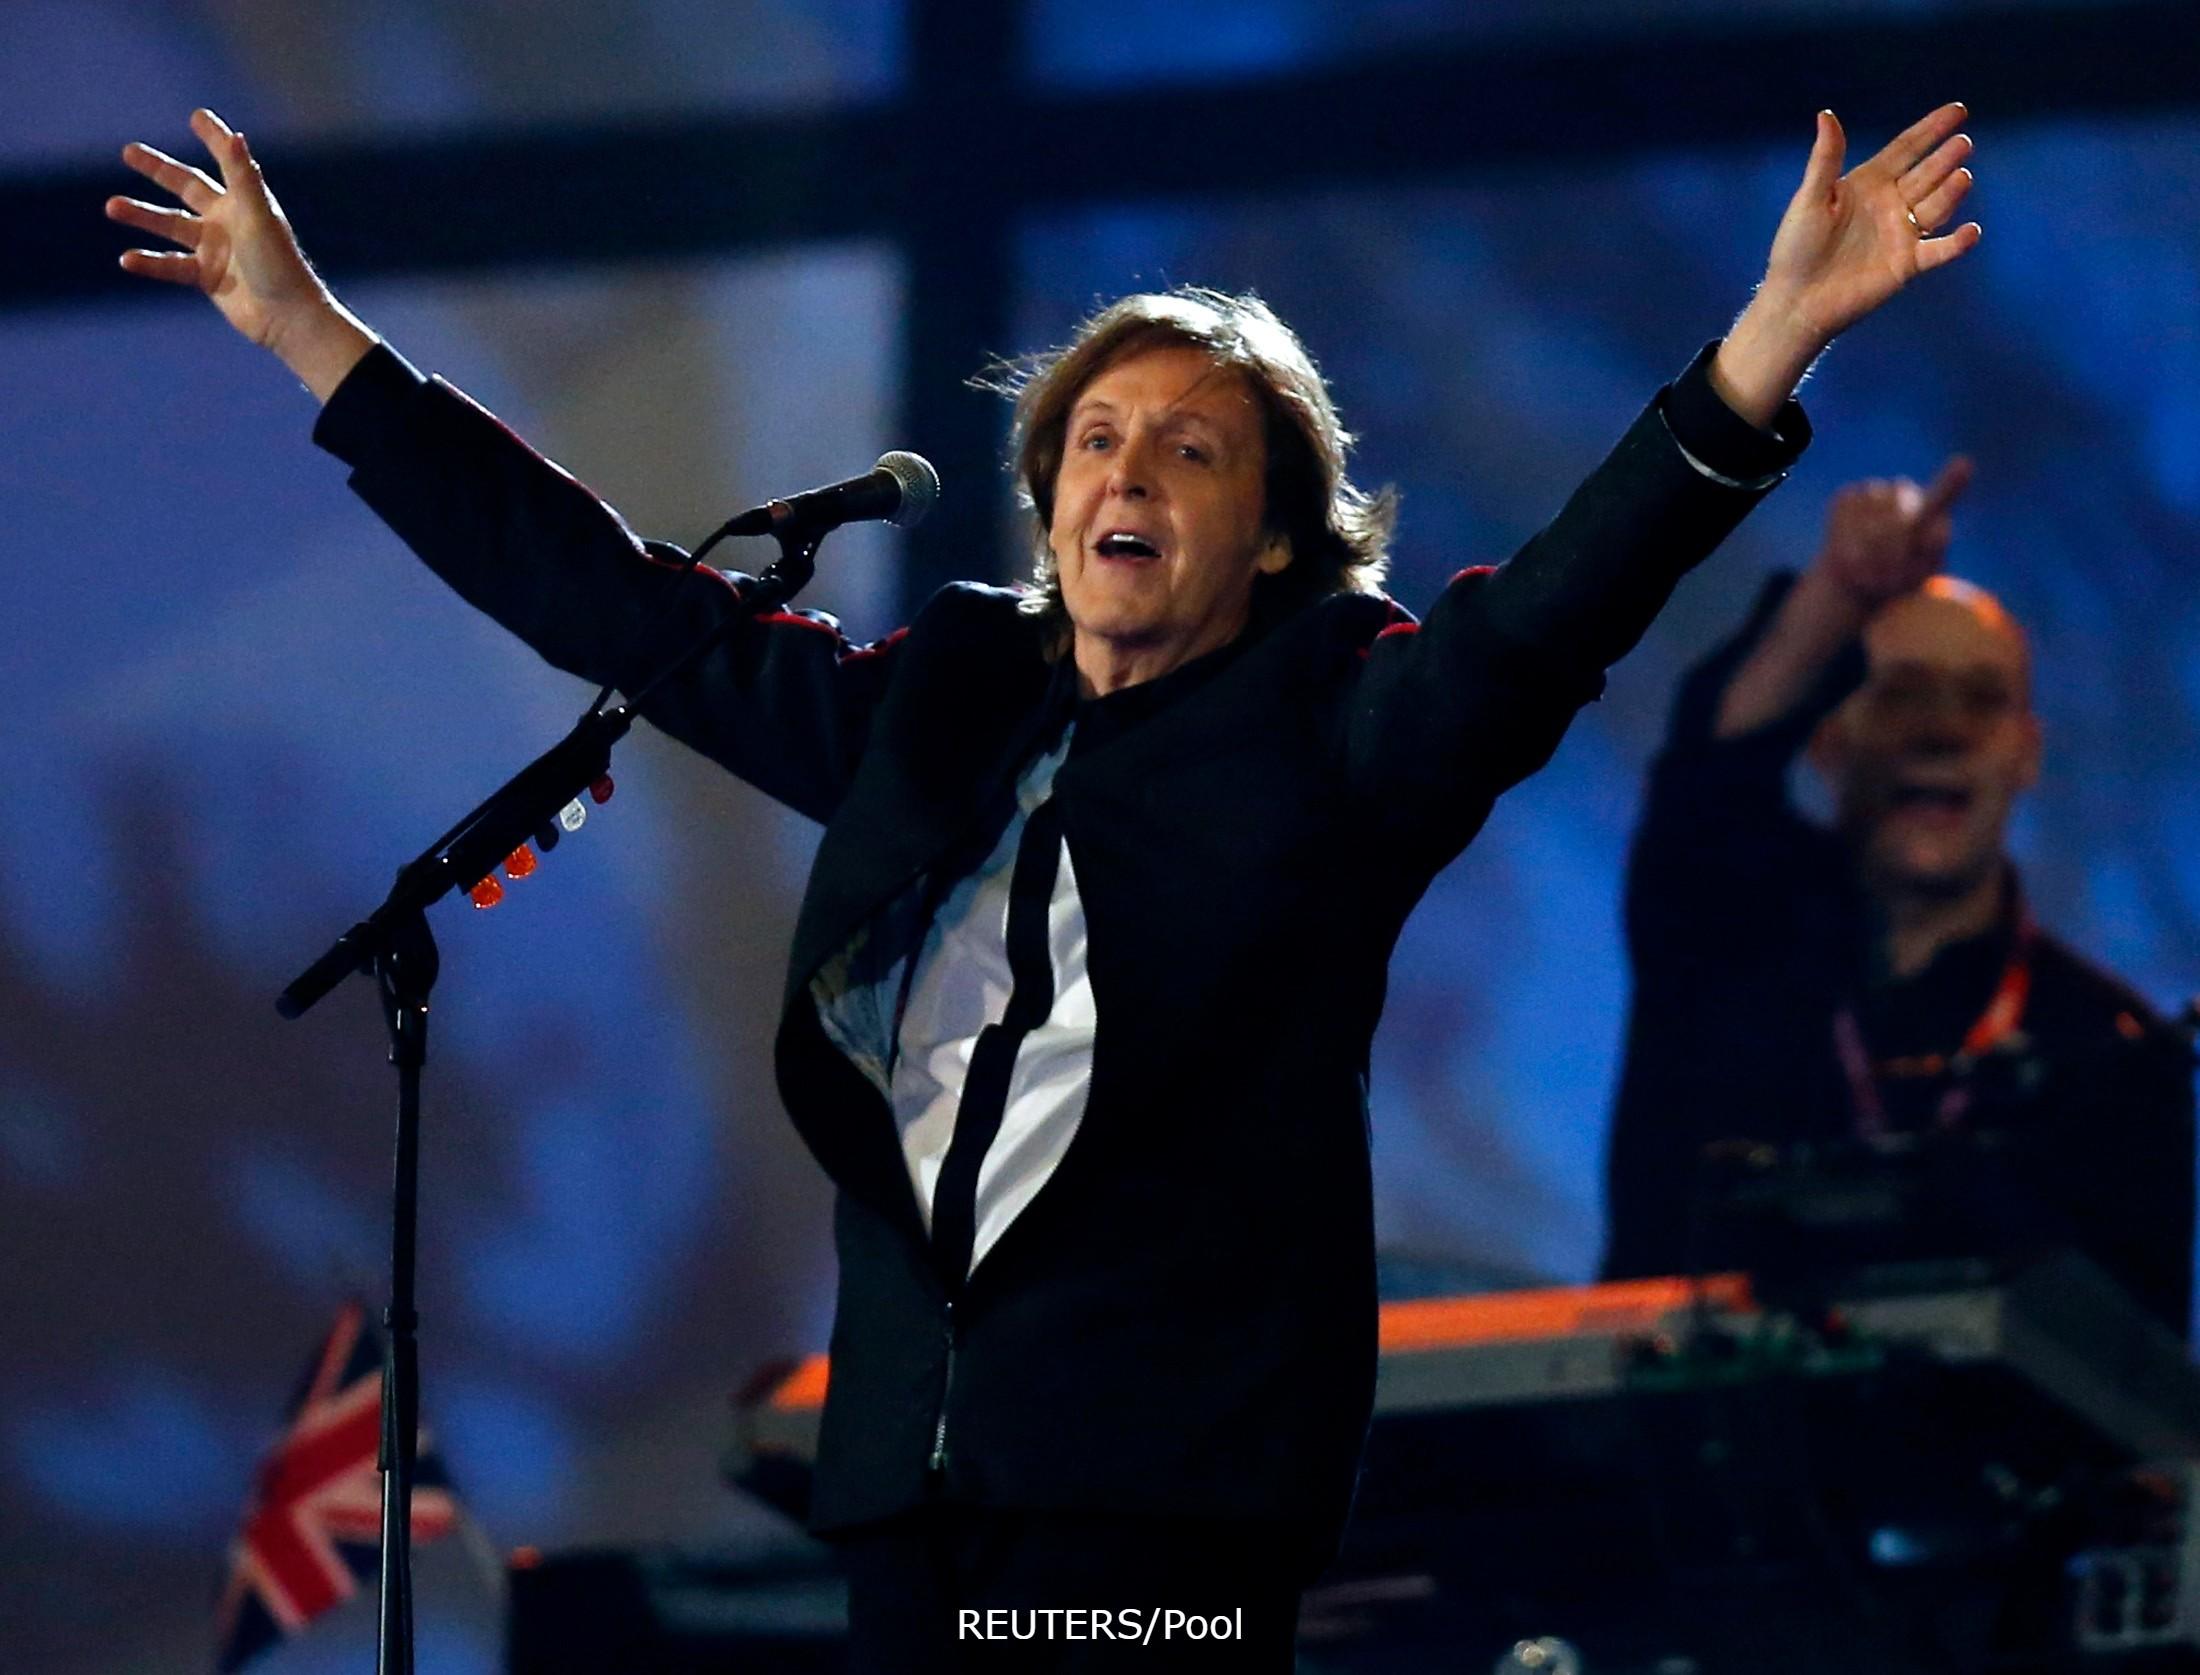 Paul McCartney RU